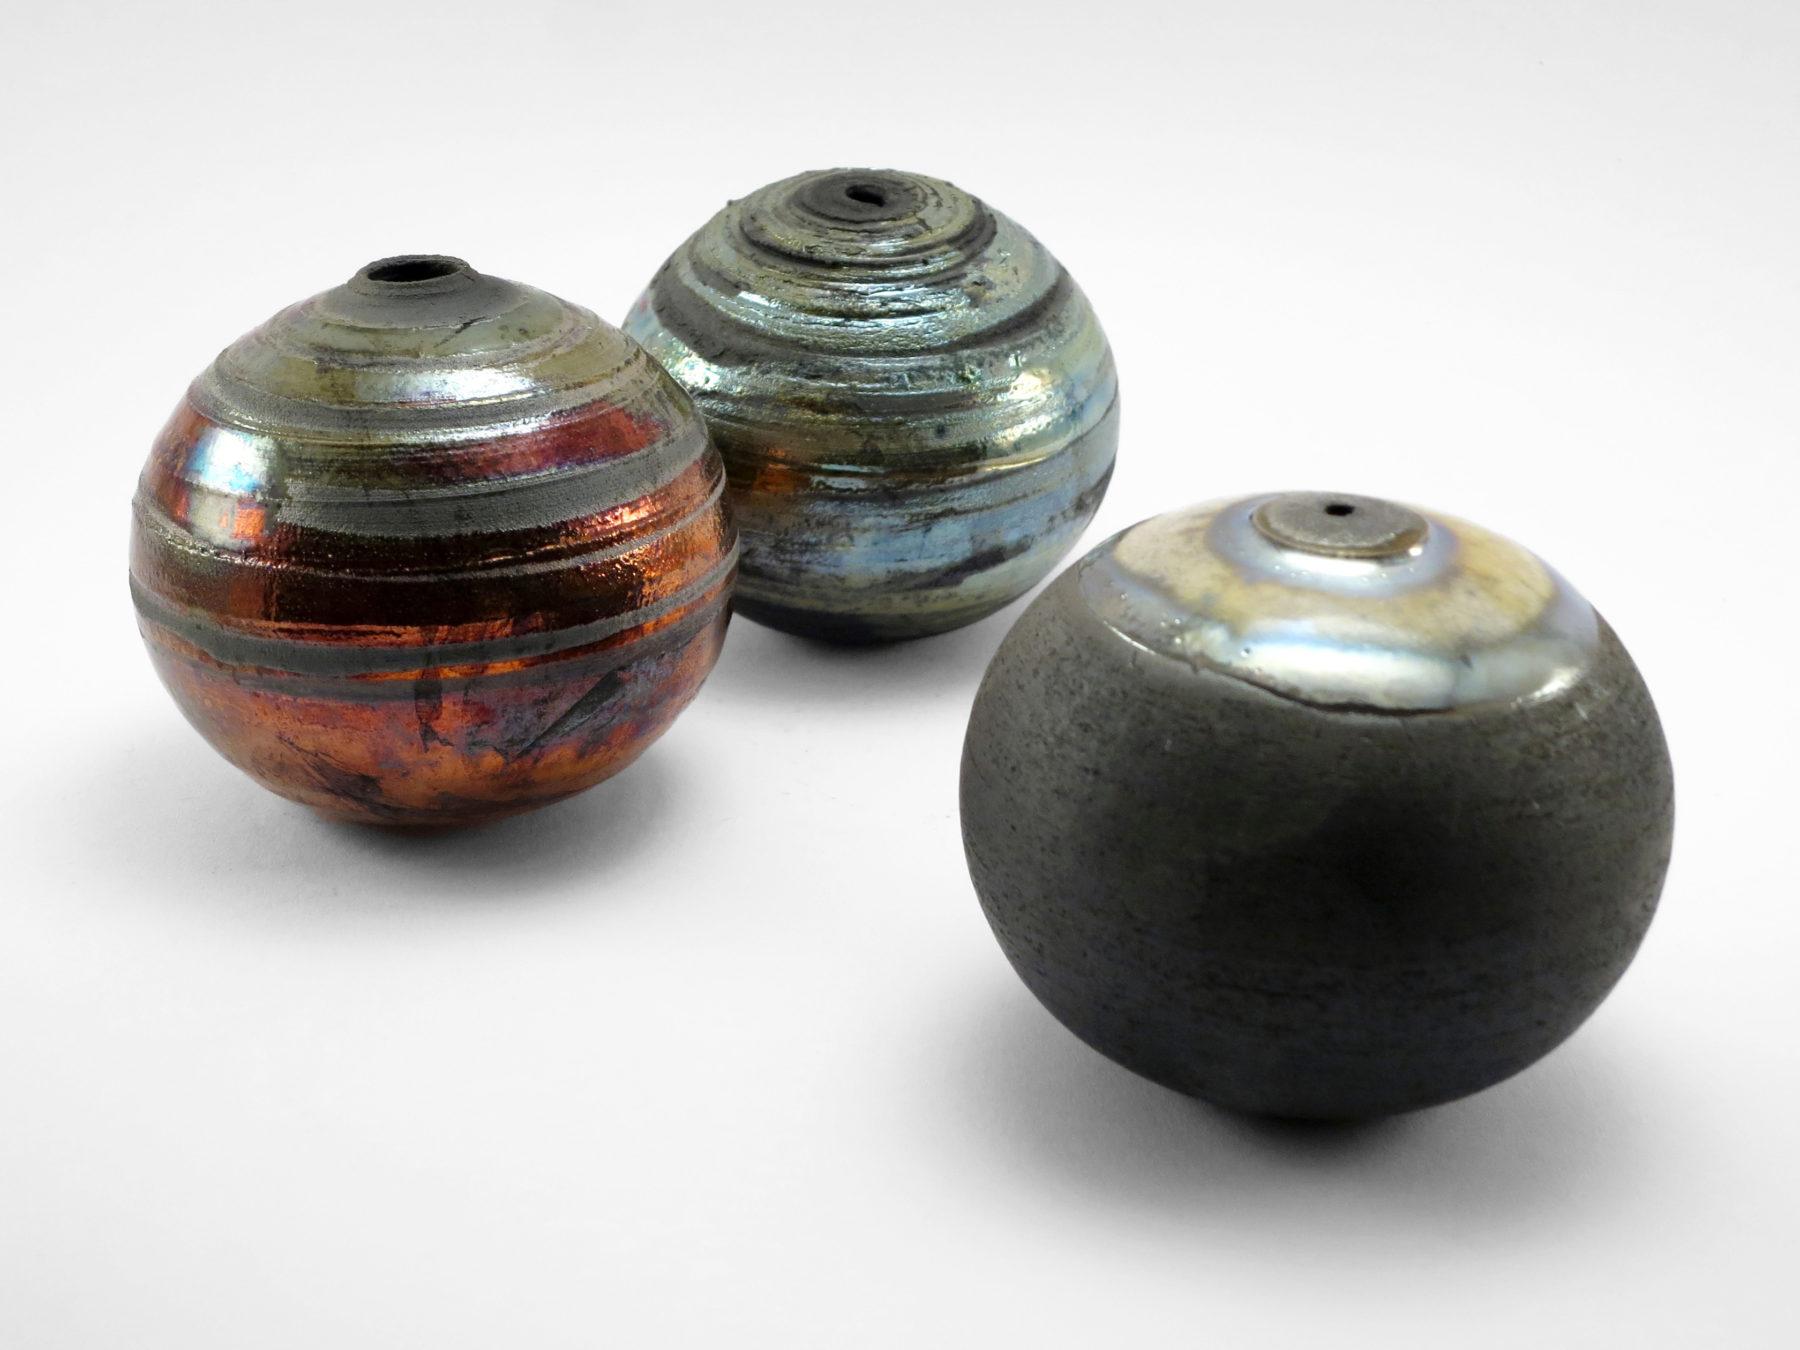 Glam and Glitter: Whispering Globes - Ildikó Károlyi